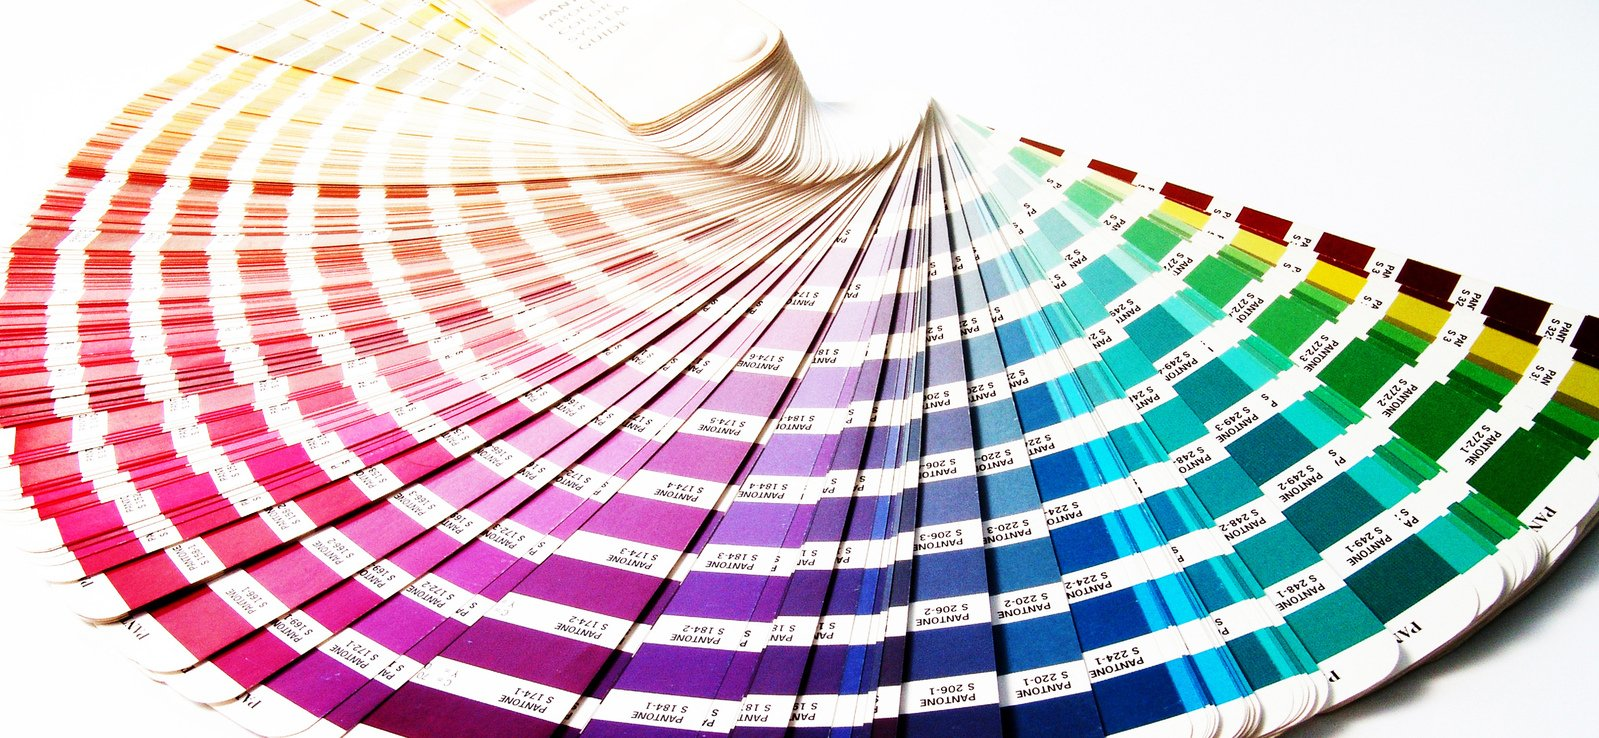 Pantone colour swatches